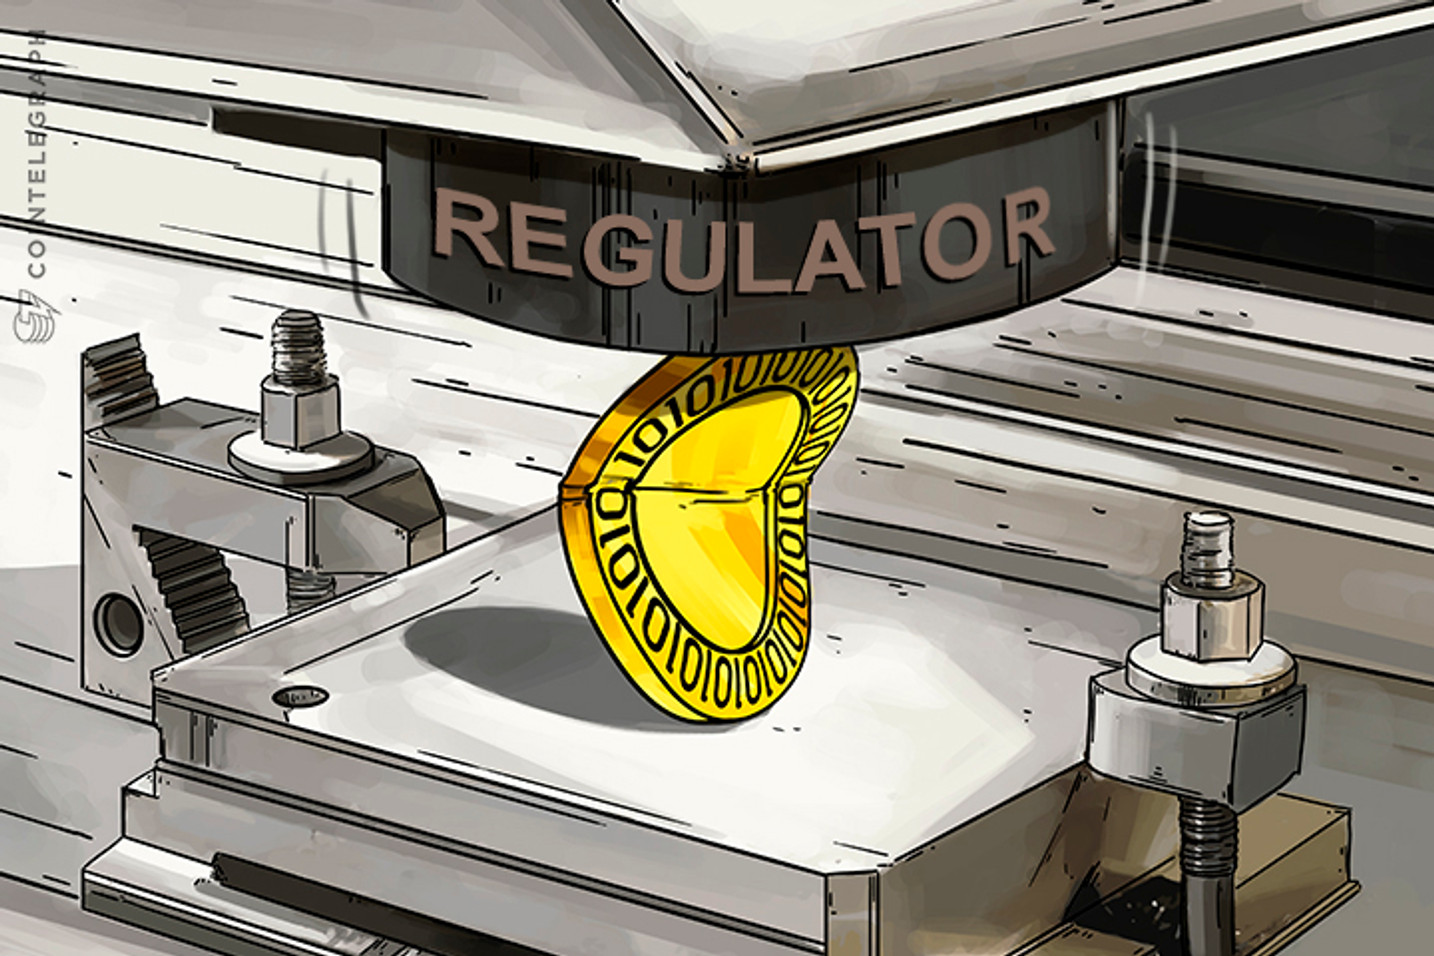 Bitcoin Halts Week-Long Slide But Battles With Regulatory Pressure